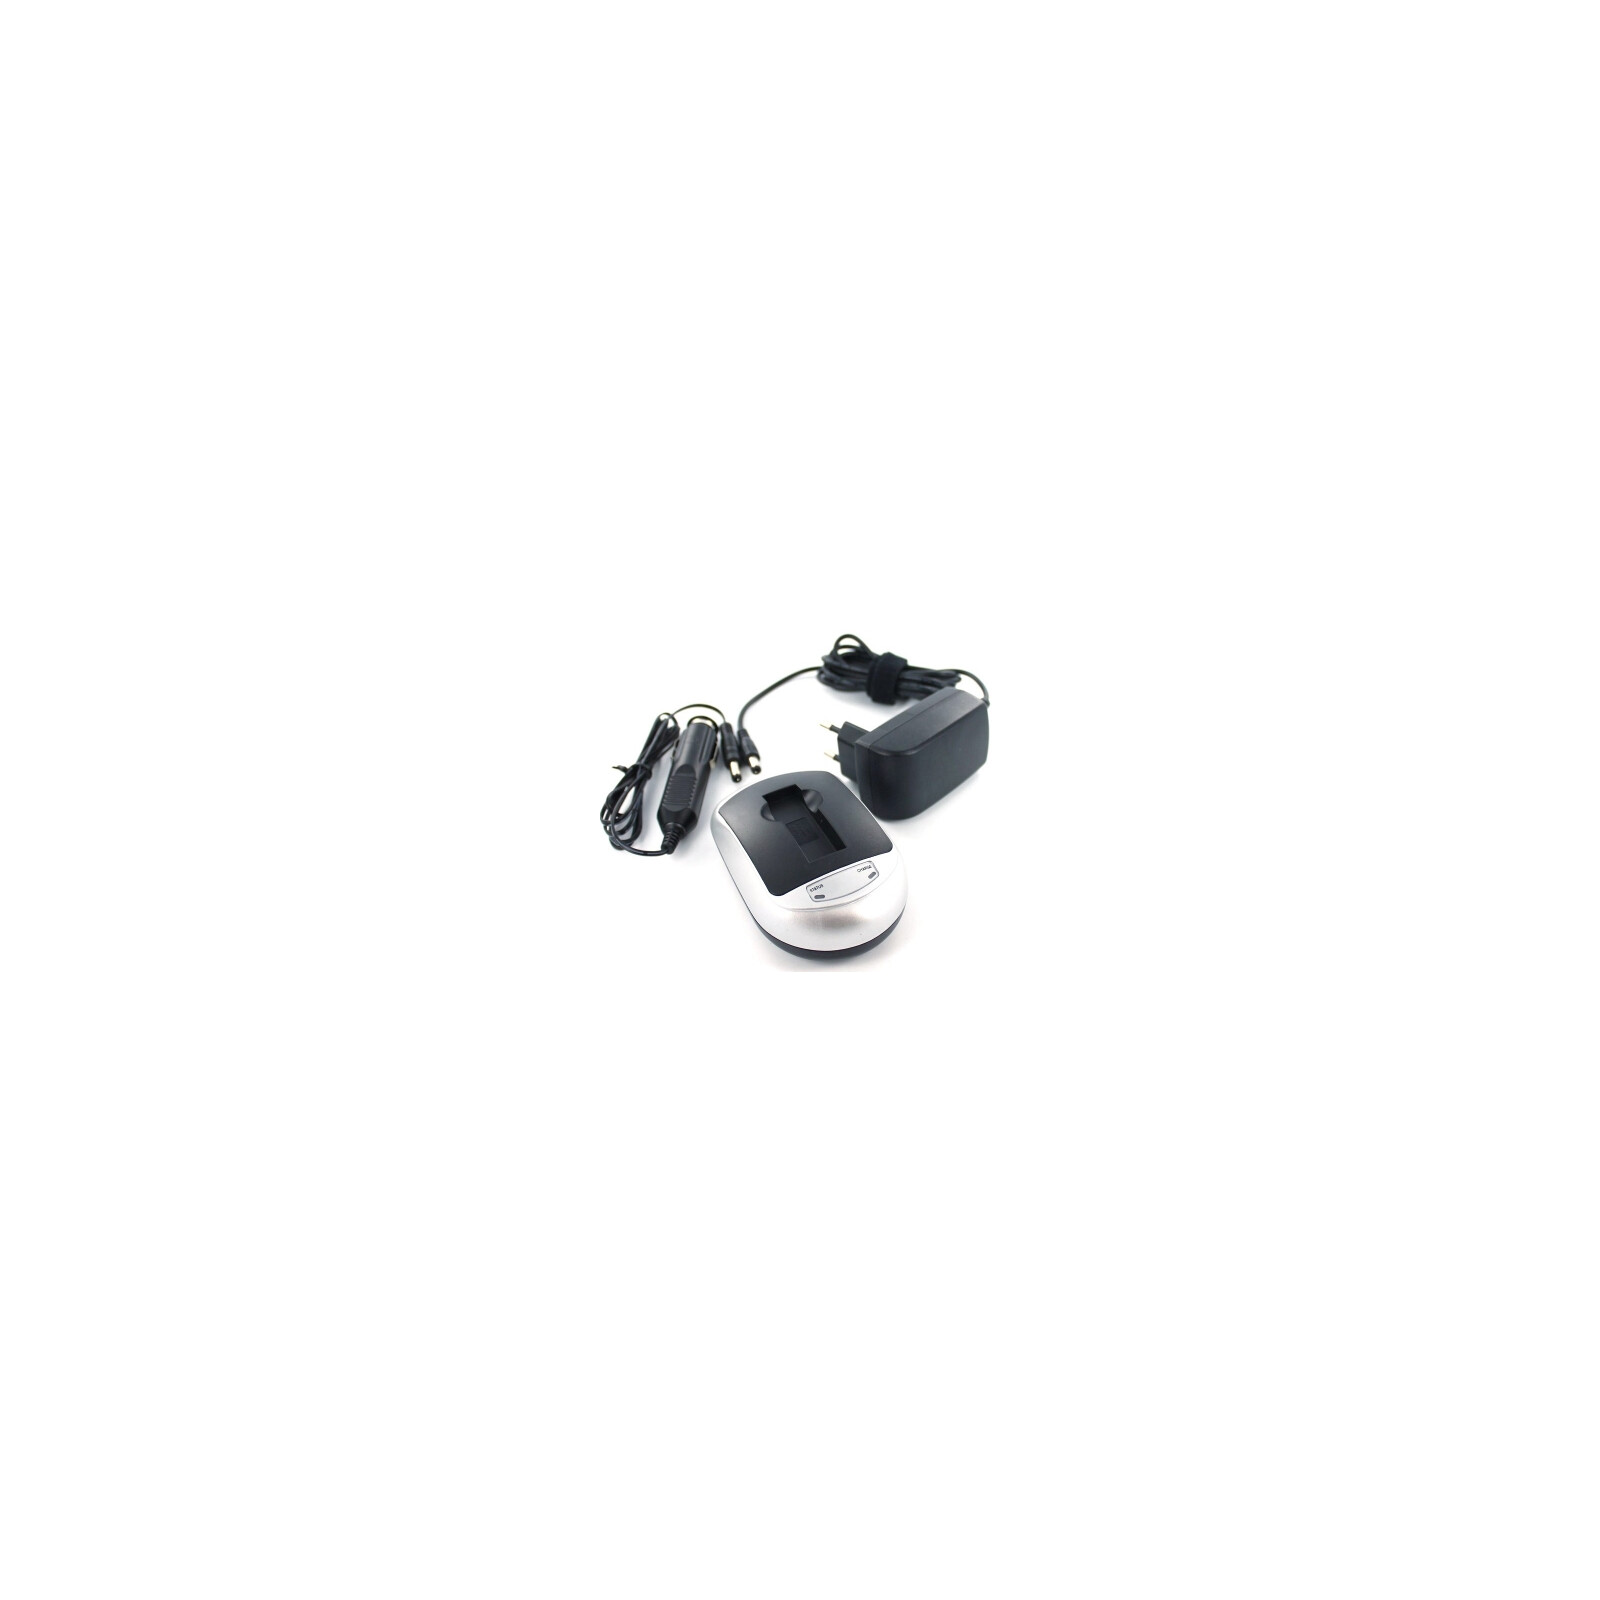 AGI 68436 Ladegerät Konica Minolta Dimage X60